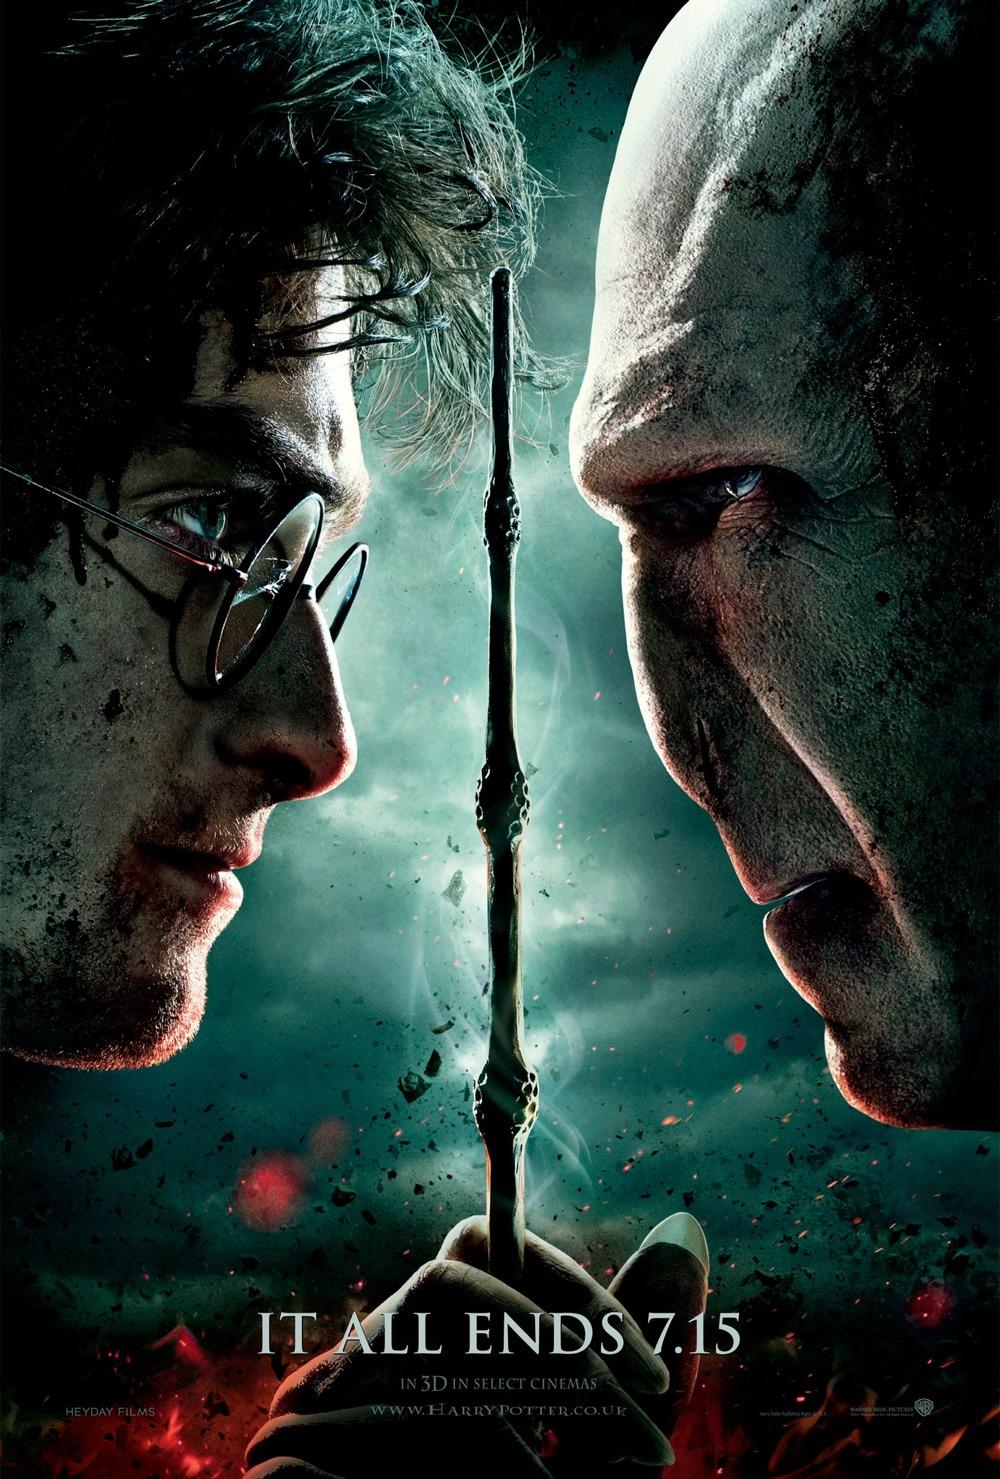 Harry Potter BlogHogwarts Poster HP7 II